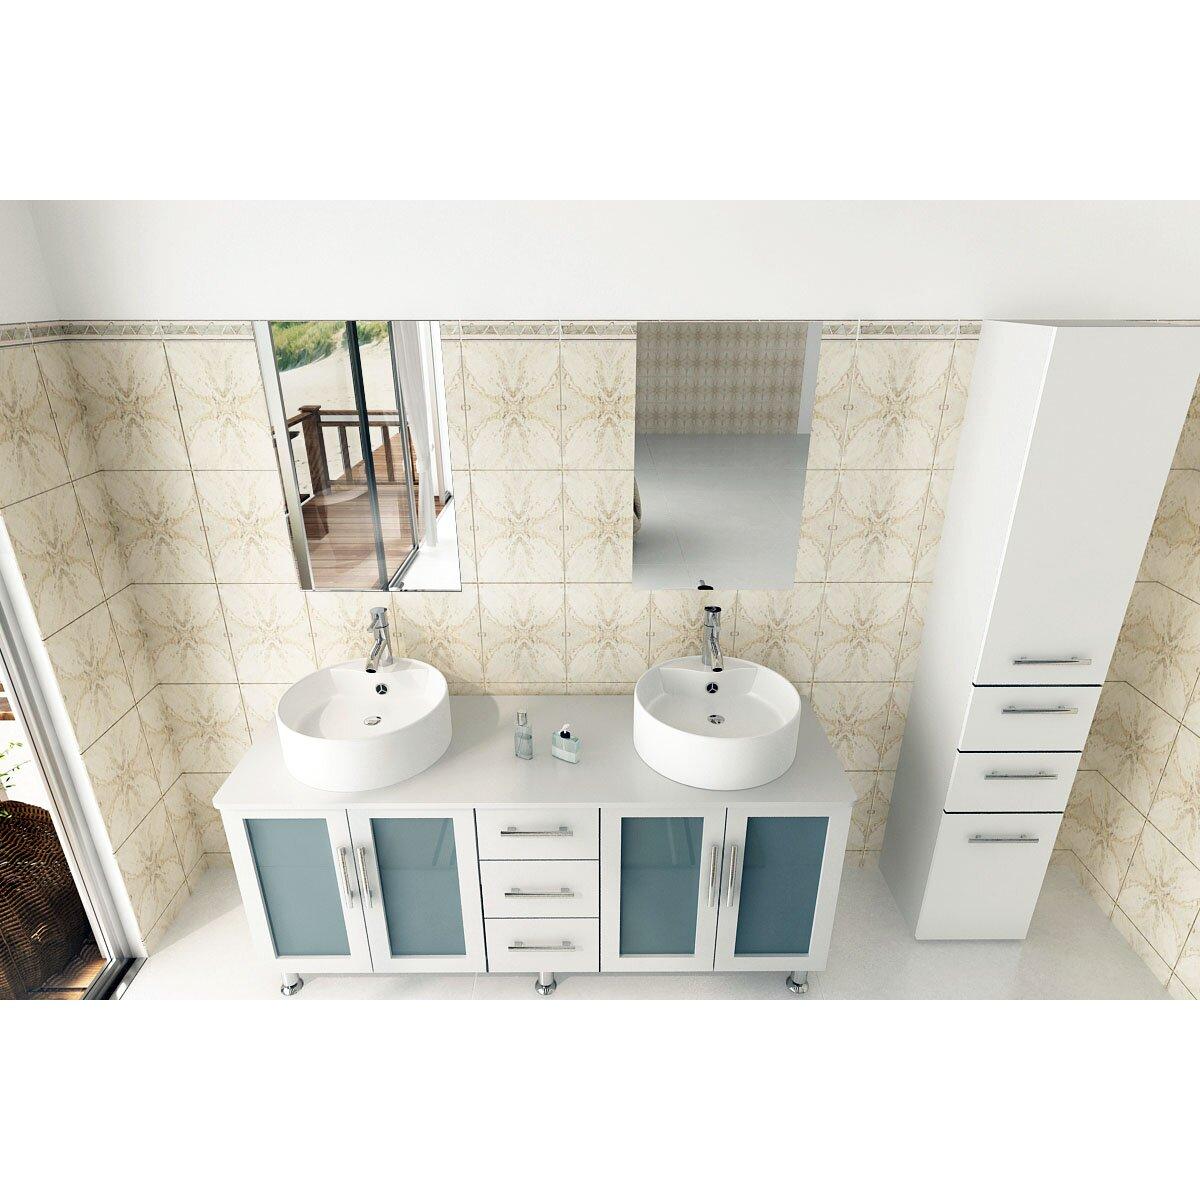 Modern Bathroom Vanity Jwh Living Lune 59 Double Vessel Modern Bathroom Vanity Set